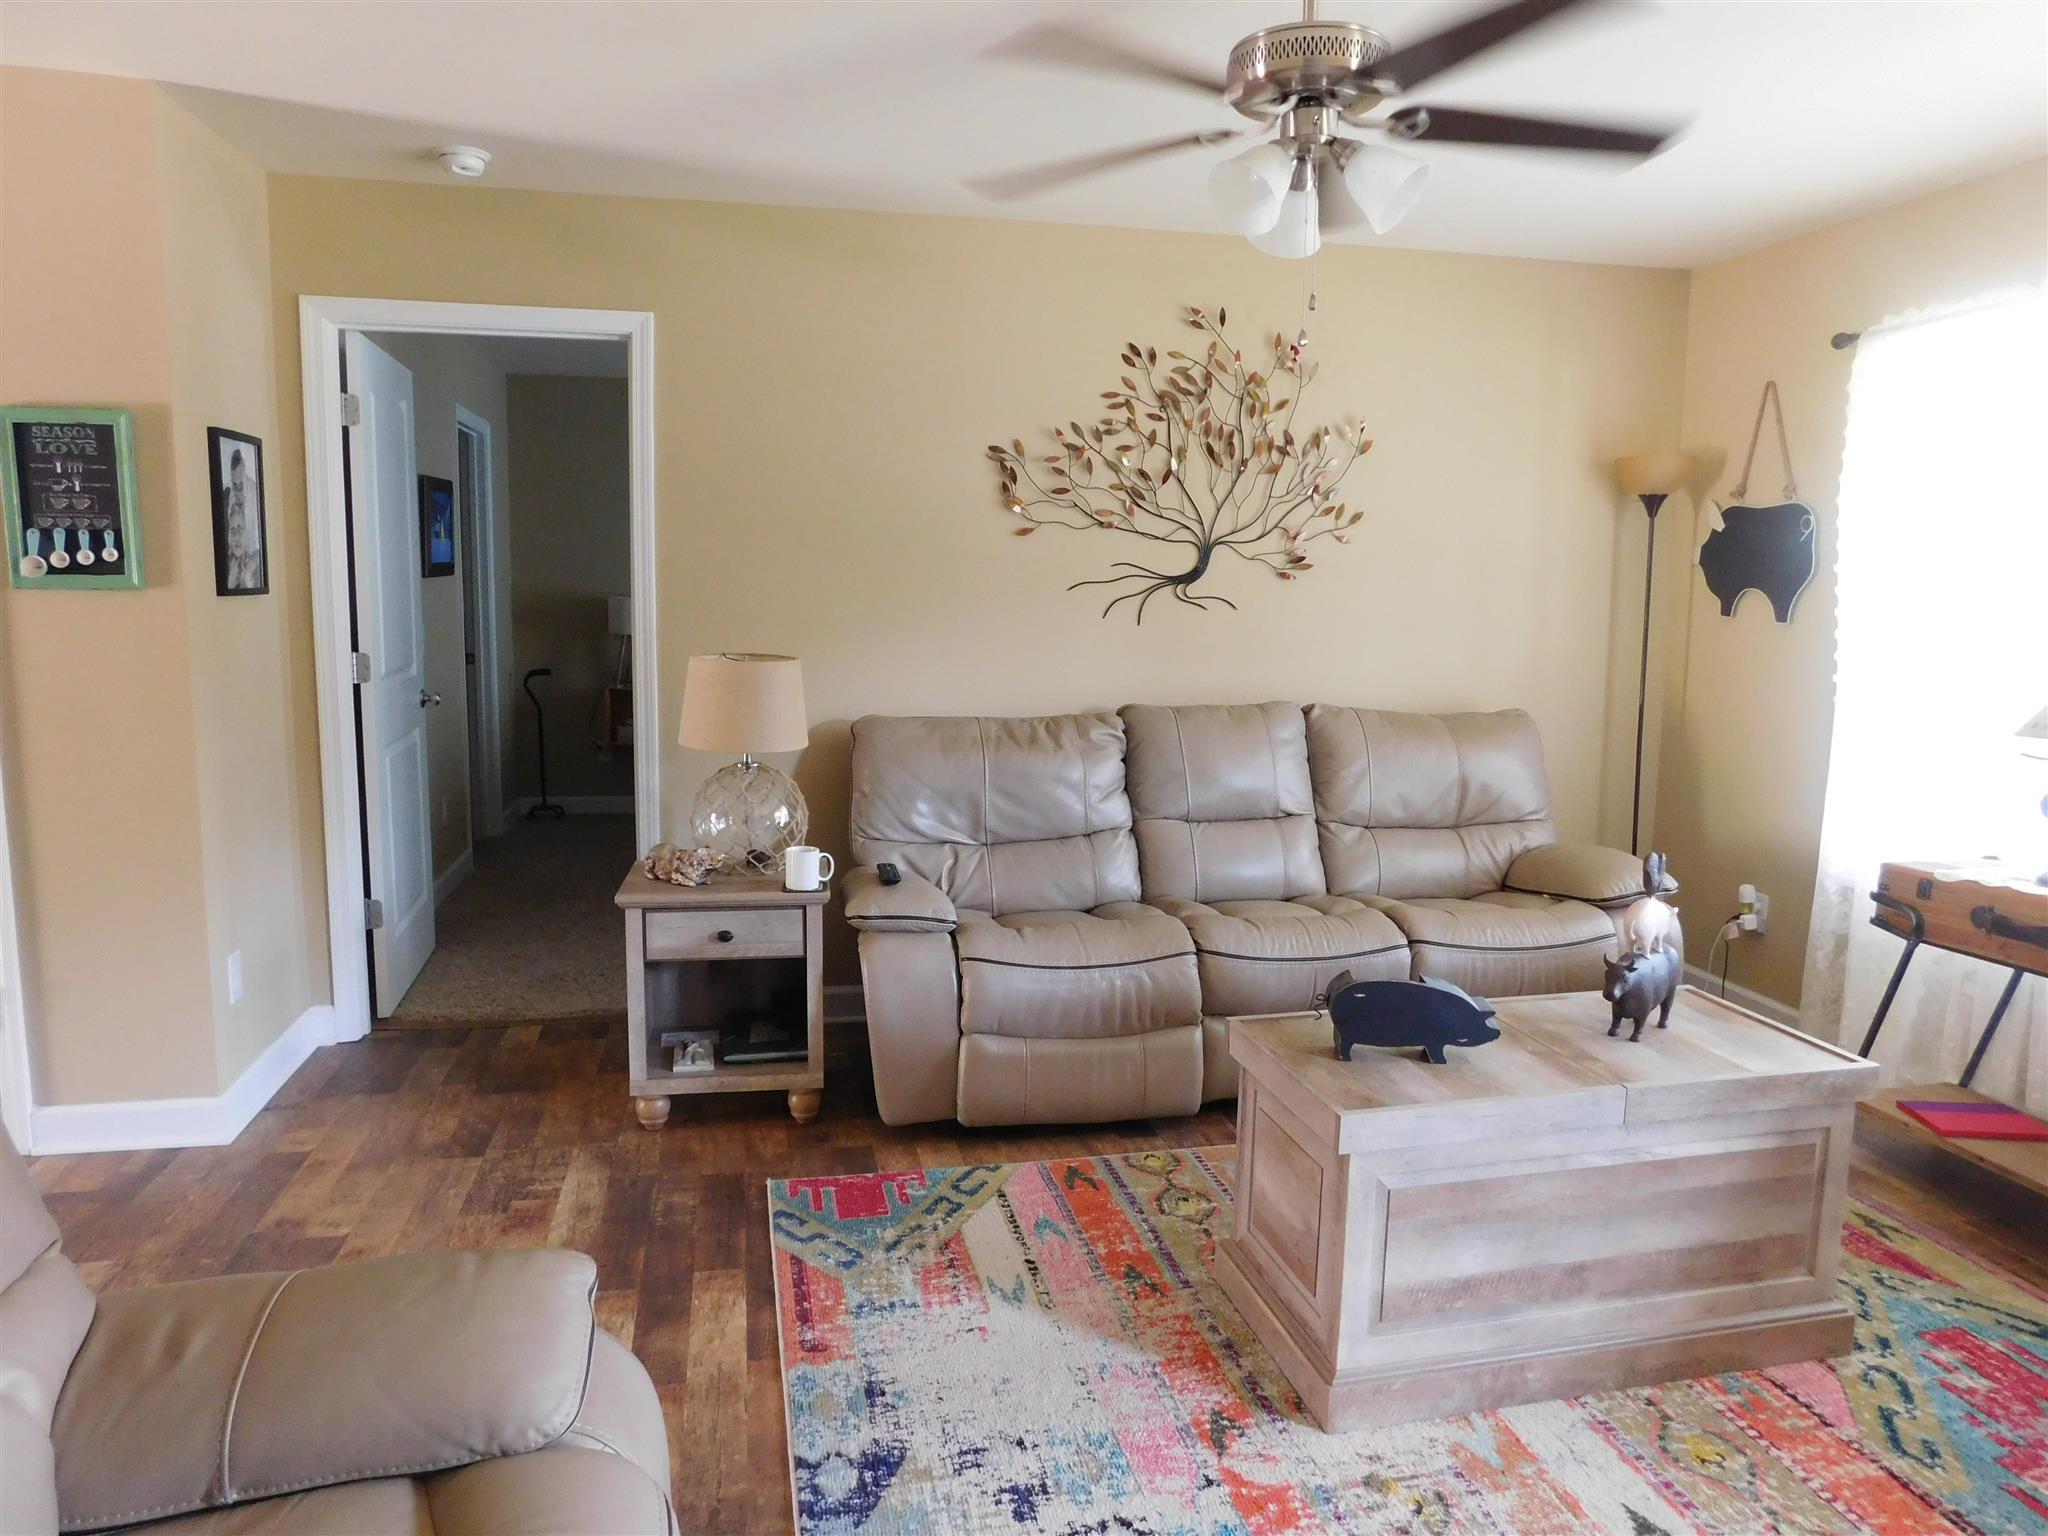 246 HIGH ST, Alexandria, TN 37012 - Alexandria, TN real estate listing